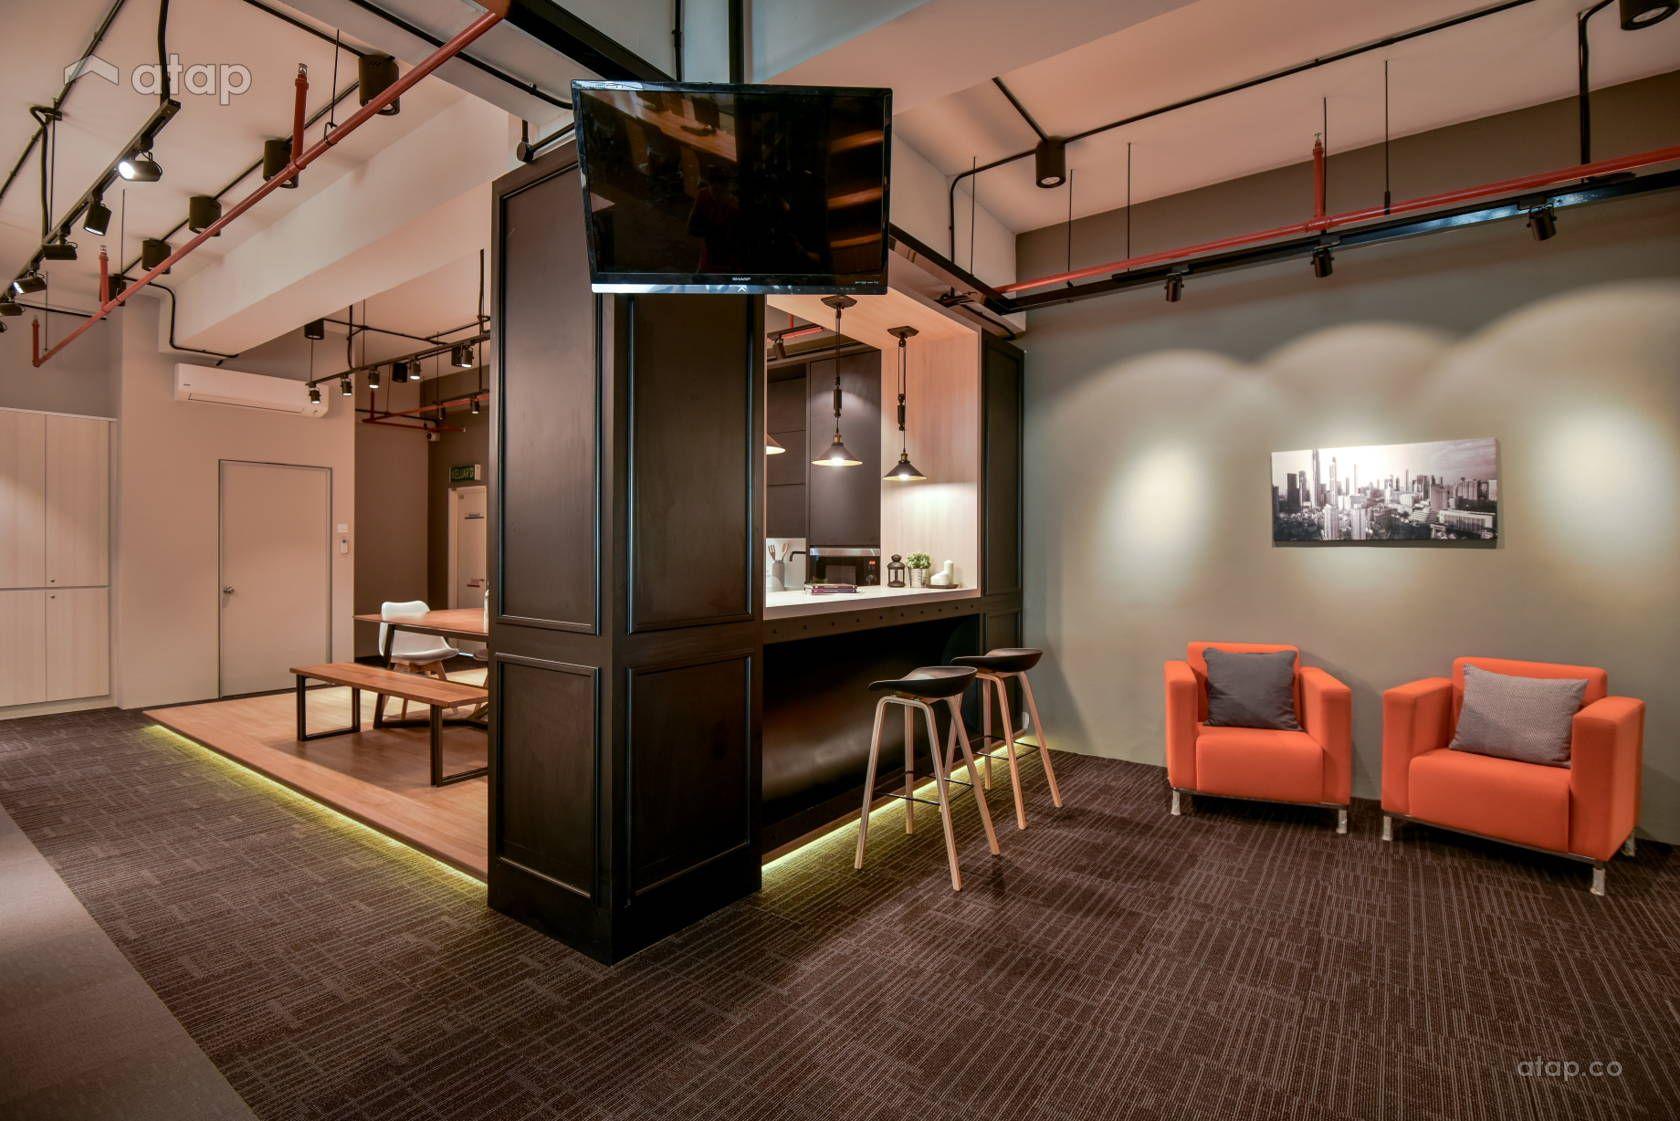 Petaling Jaya Office Interior Design Renovation Ideas Photos And Price In Malaysia Atap Co Office Interior Design Interior Design Interior